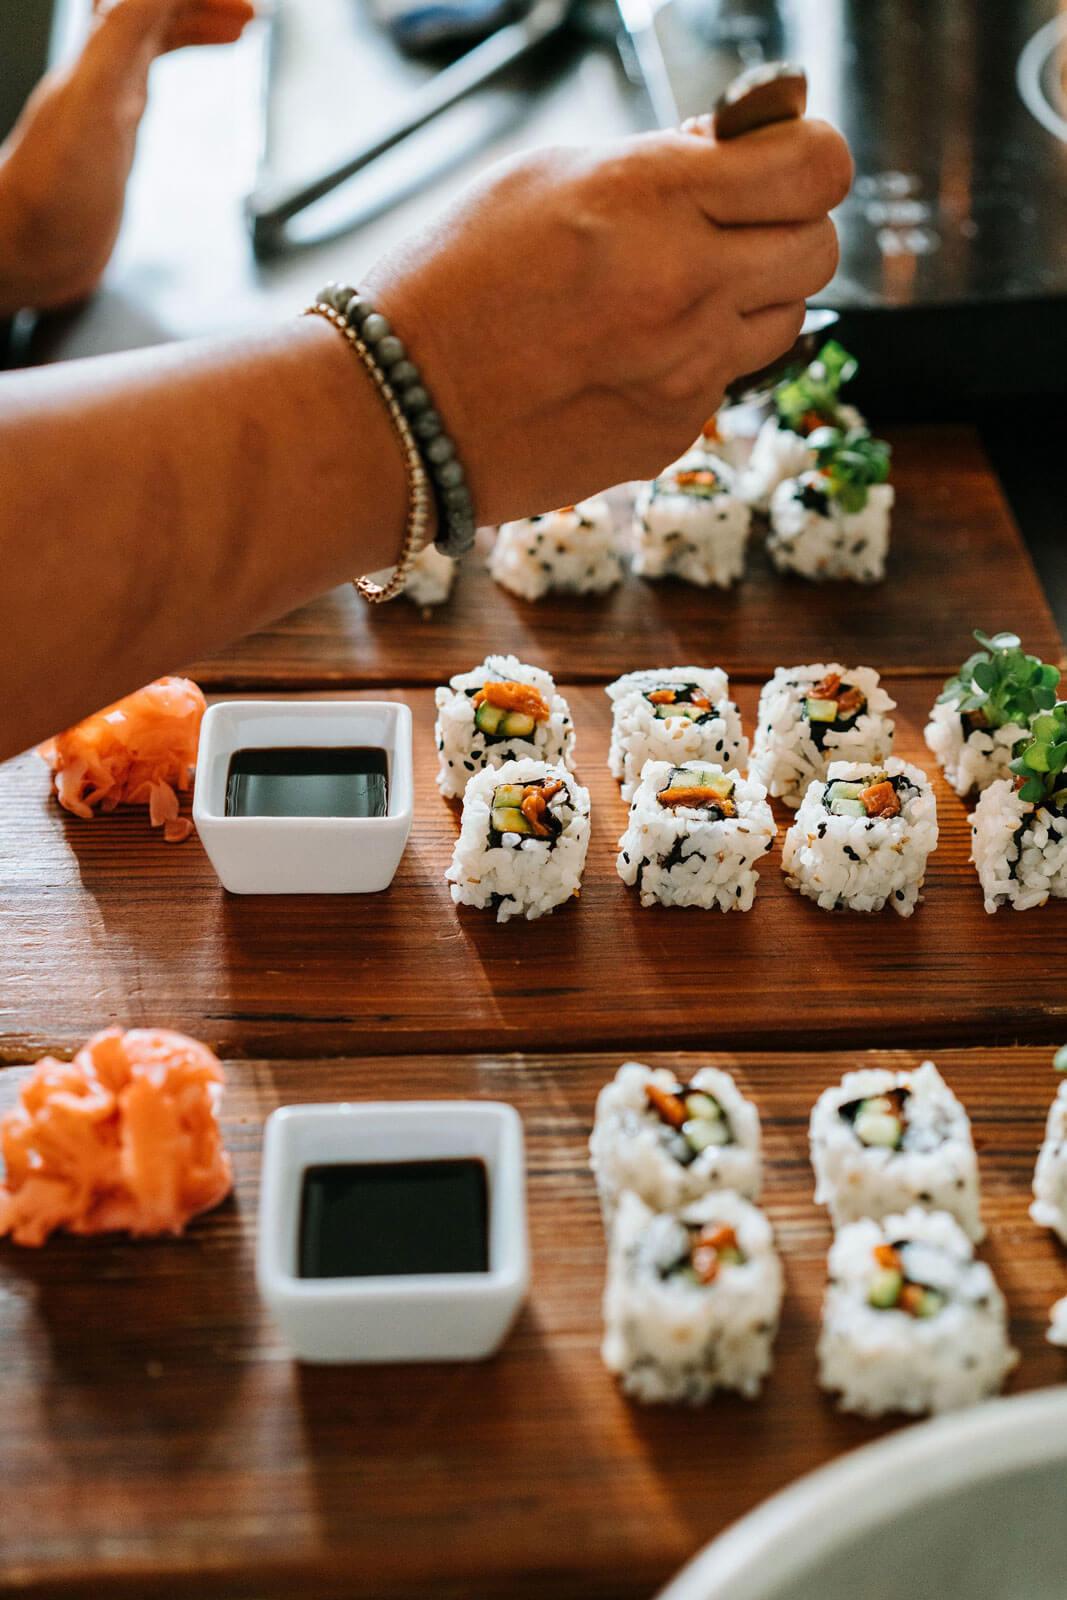 Salmon sushi rolls on wood boards